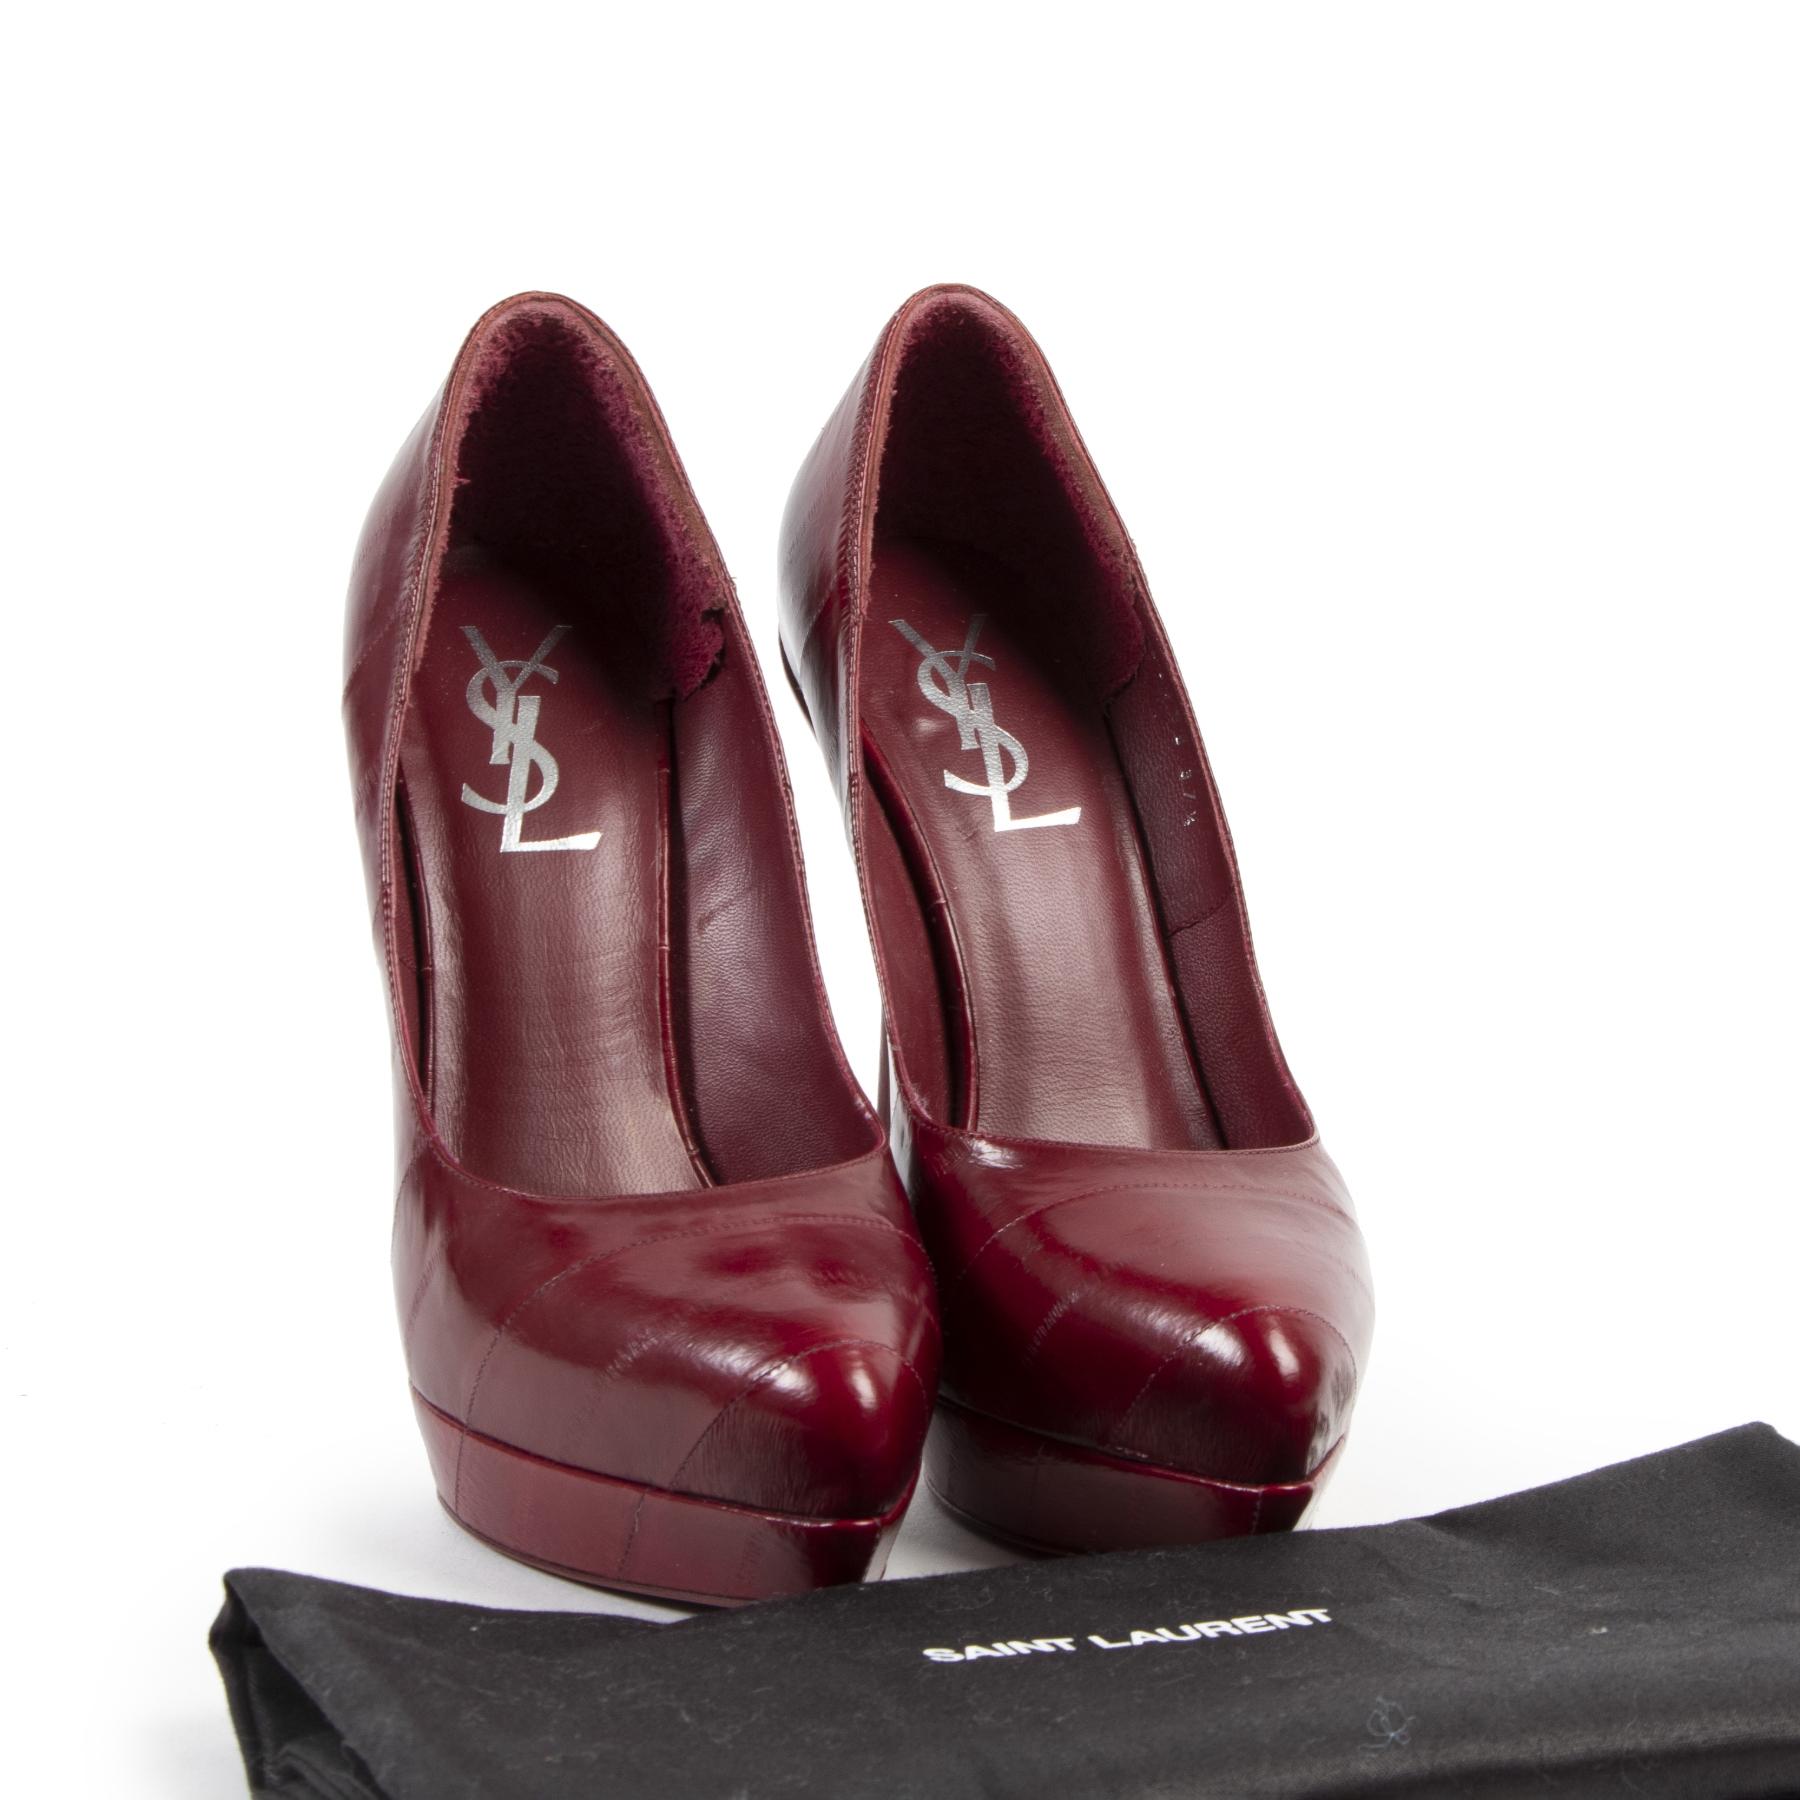 Authentic secondhand Saint Laurent Burgundy Leather Platform Heels - Size 37,5 designer shoes bags fashion luxury vintage webshop safe secure online shopping